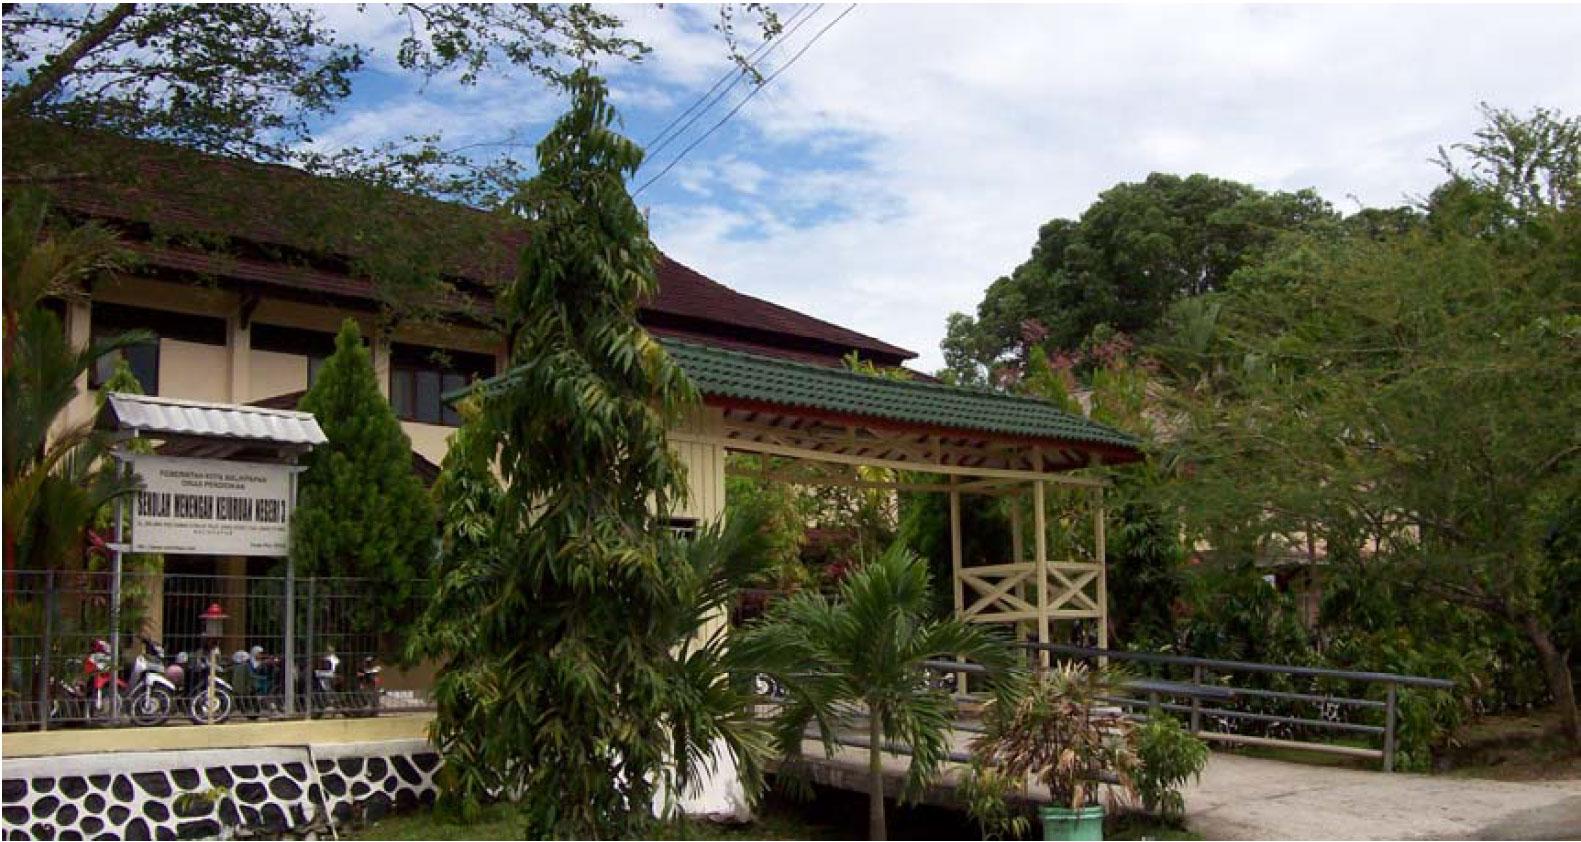 Sejarah SMK Negeri 3 Balikpapan